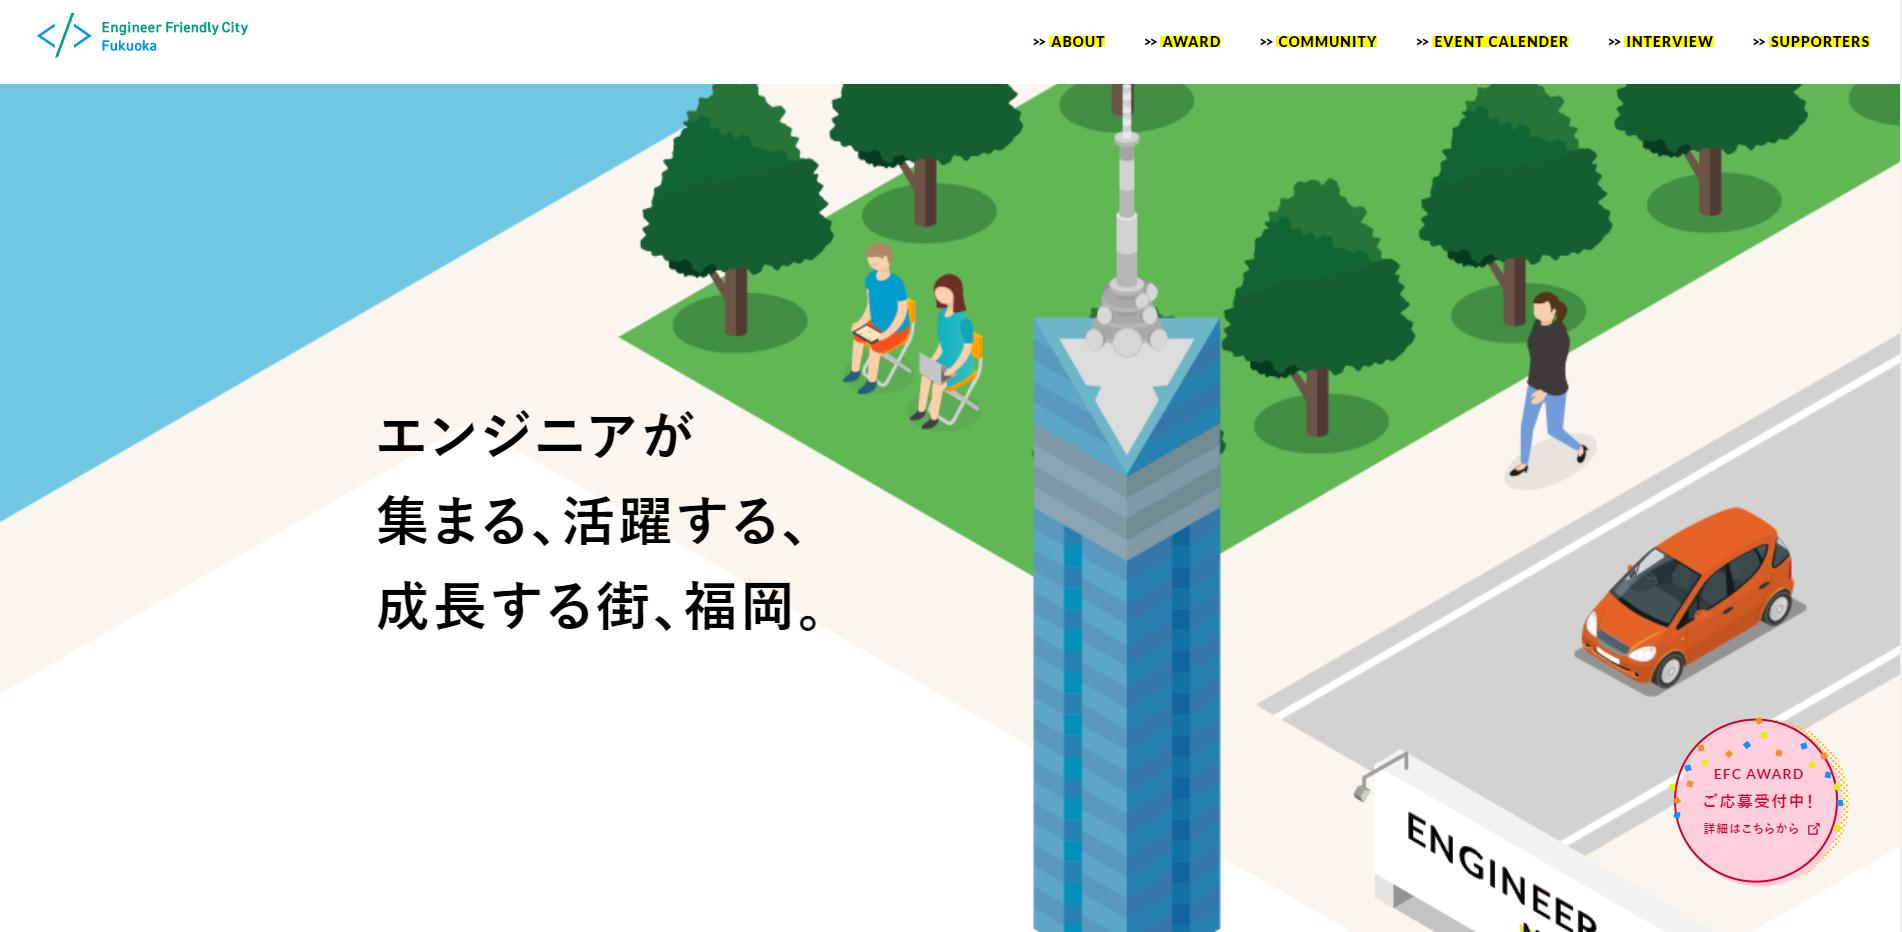 Engineer Friendly City